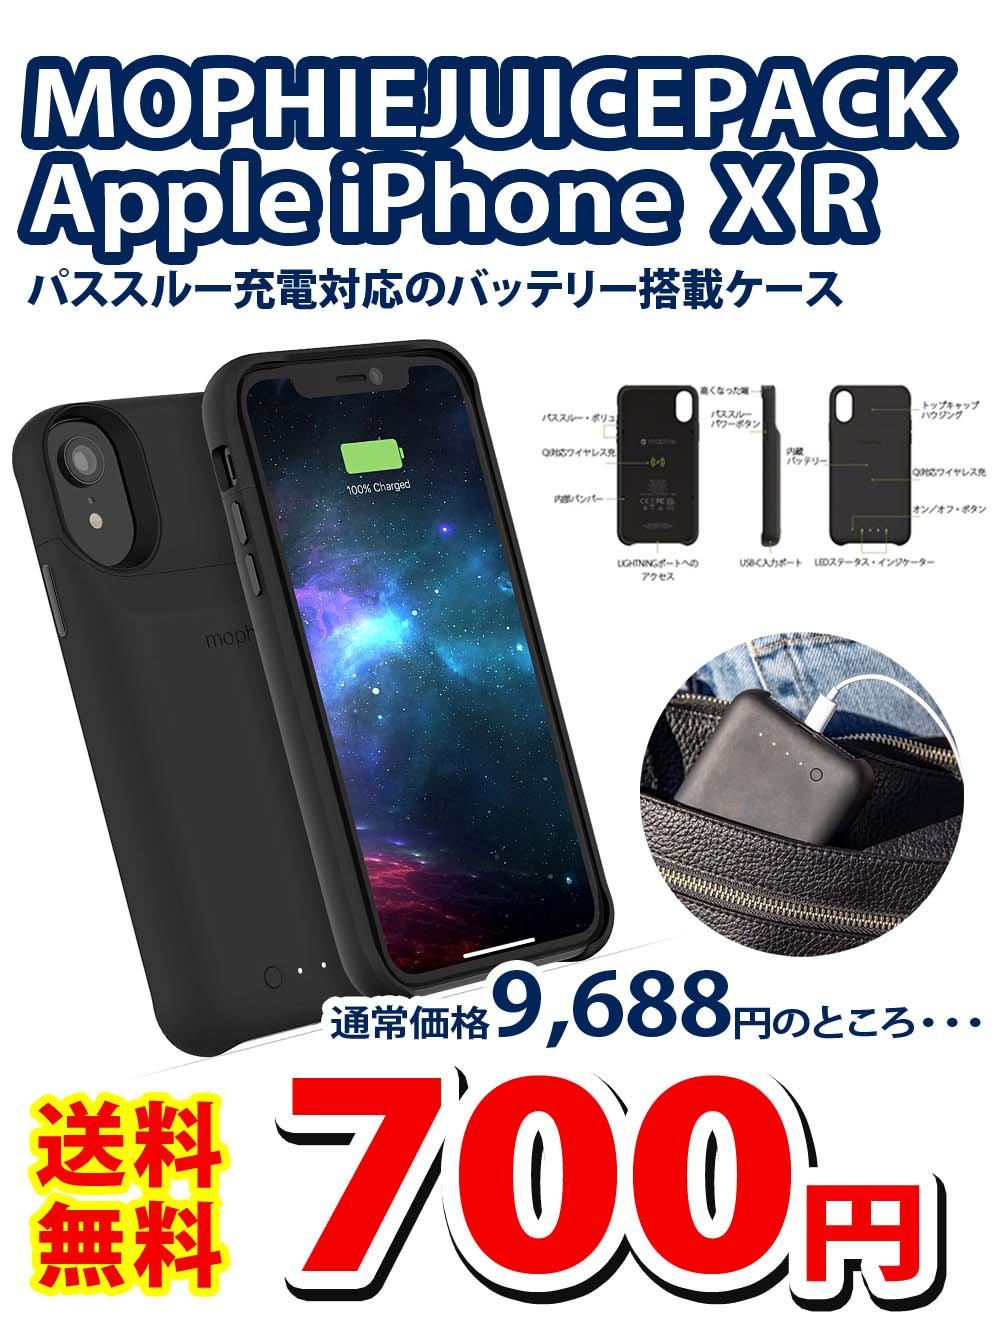 【送料無料】mophie juice pack Access Apple iPhone X / XR【700円】定価9688円